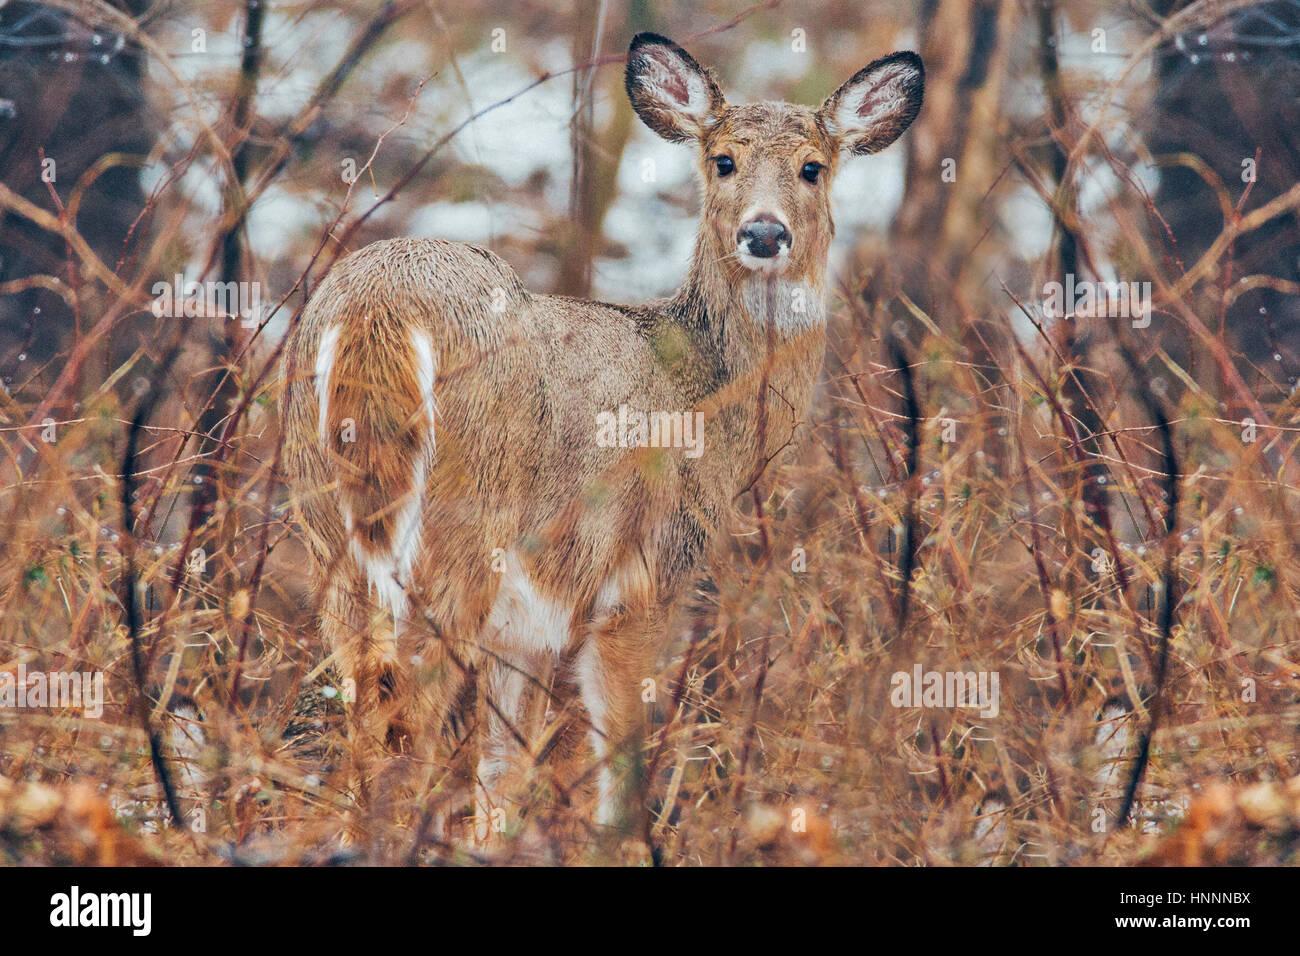 Portrait of deer on field - Stock Image